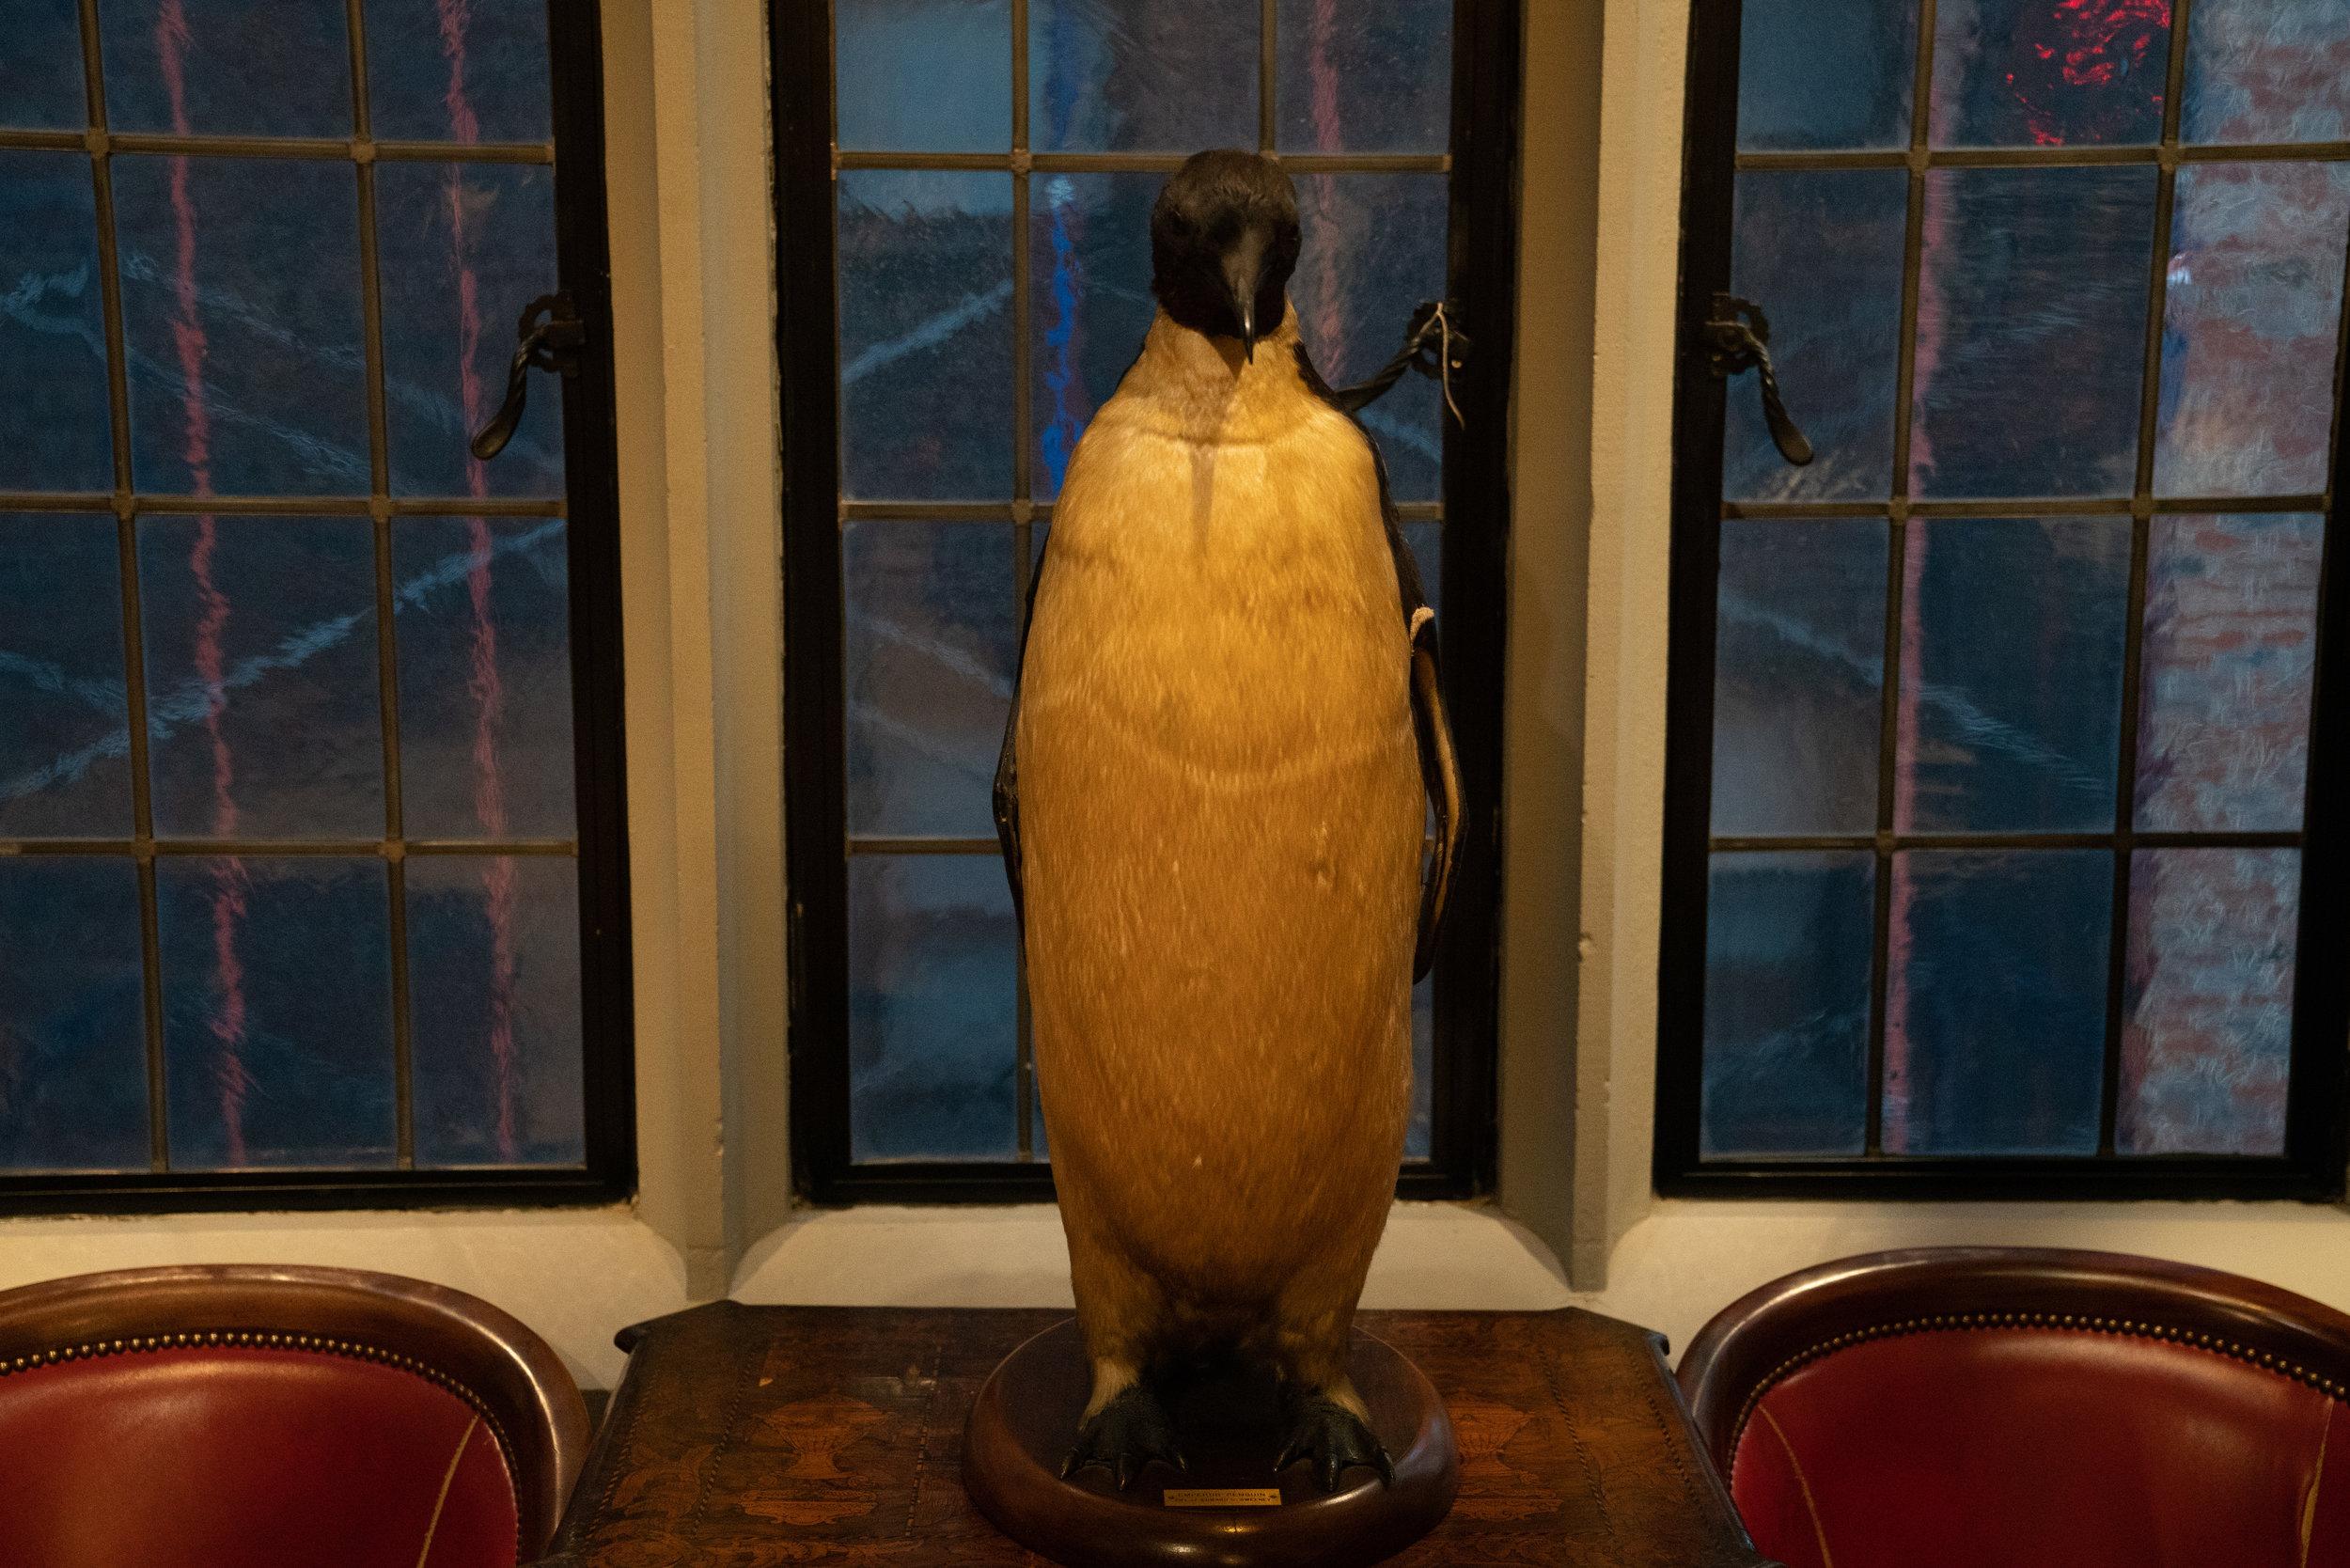 An ex-penguin in the trophy room.